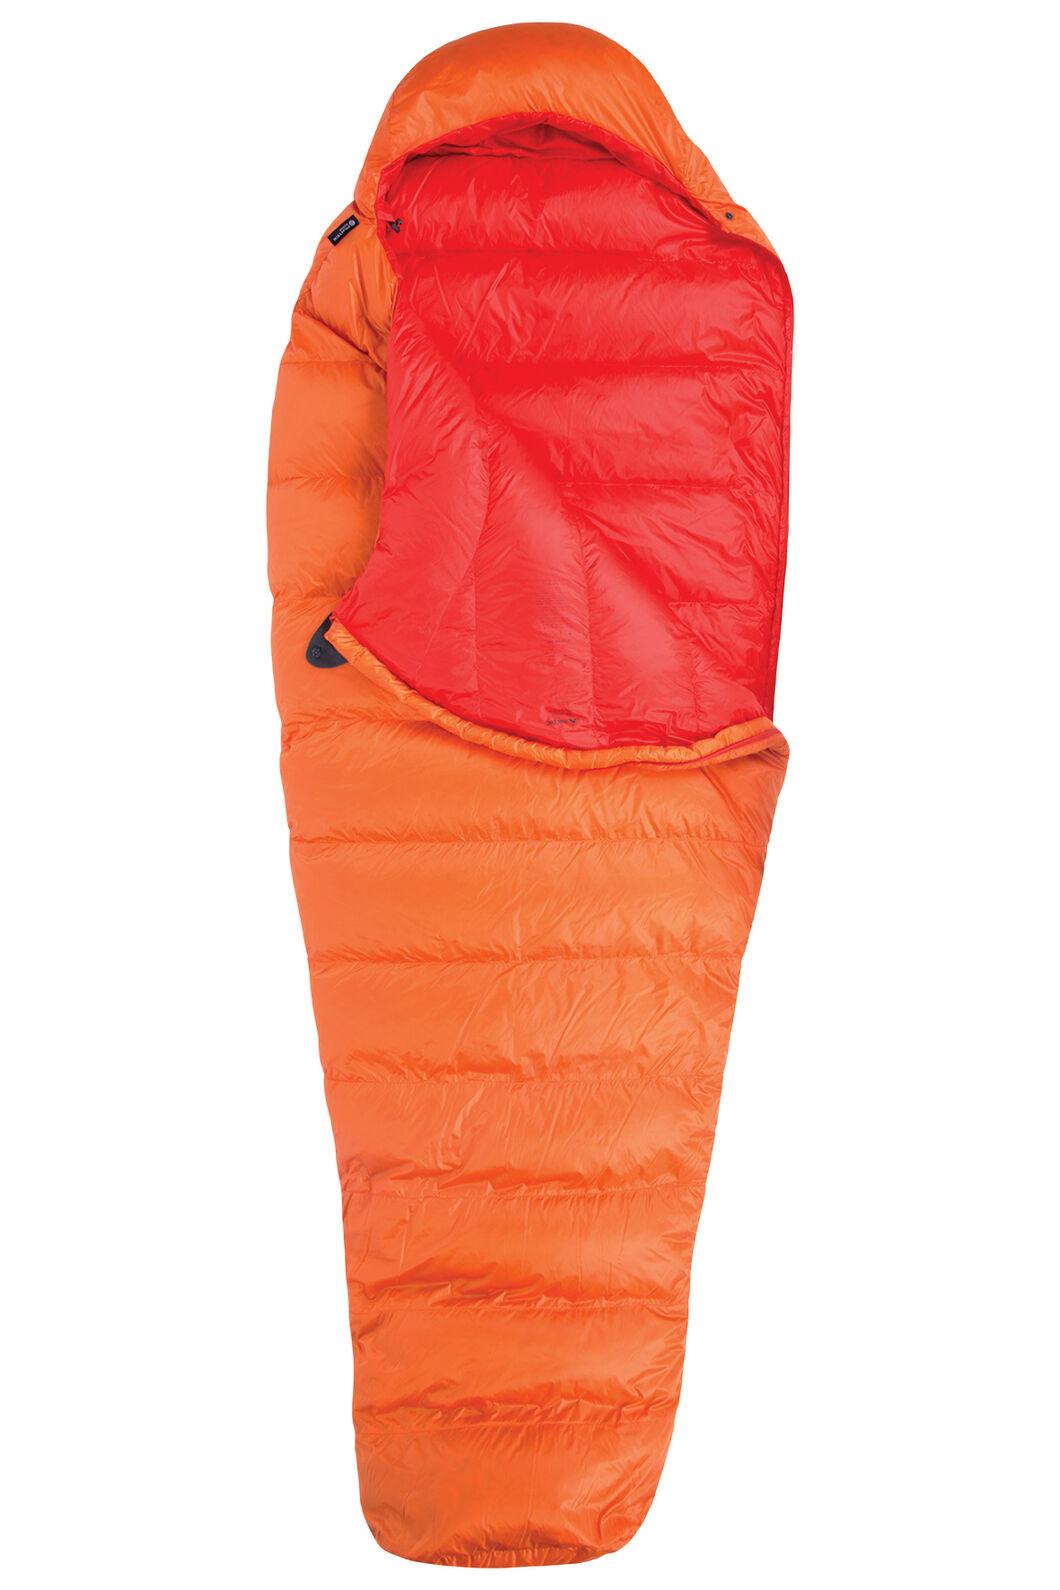 Macpac Epic HyperDRY™ Down 400 Sleeping Bag - Extra Large, Exuberance/ Indicator, hi-res